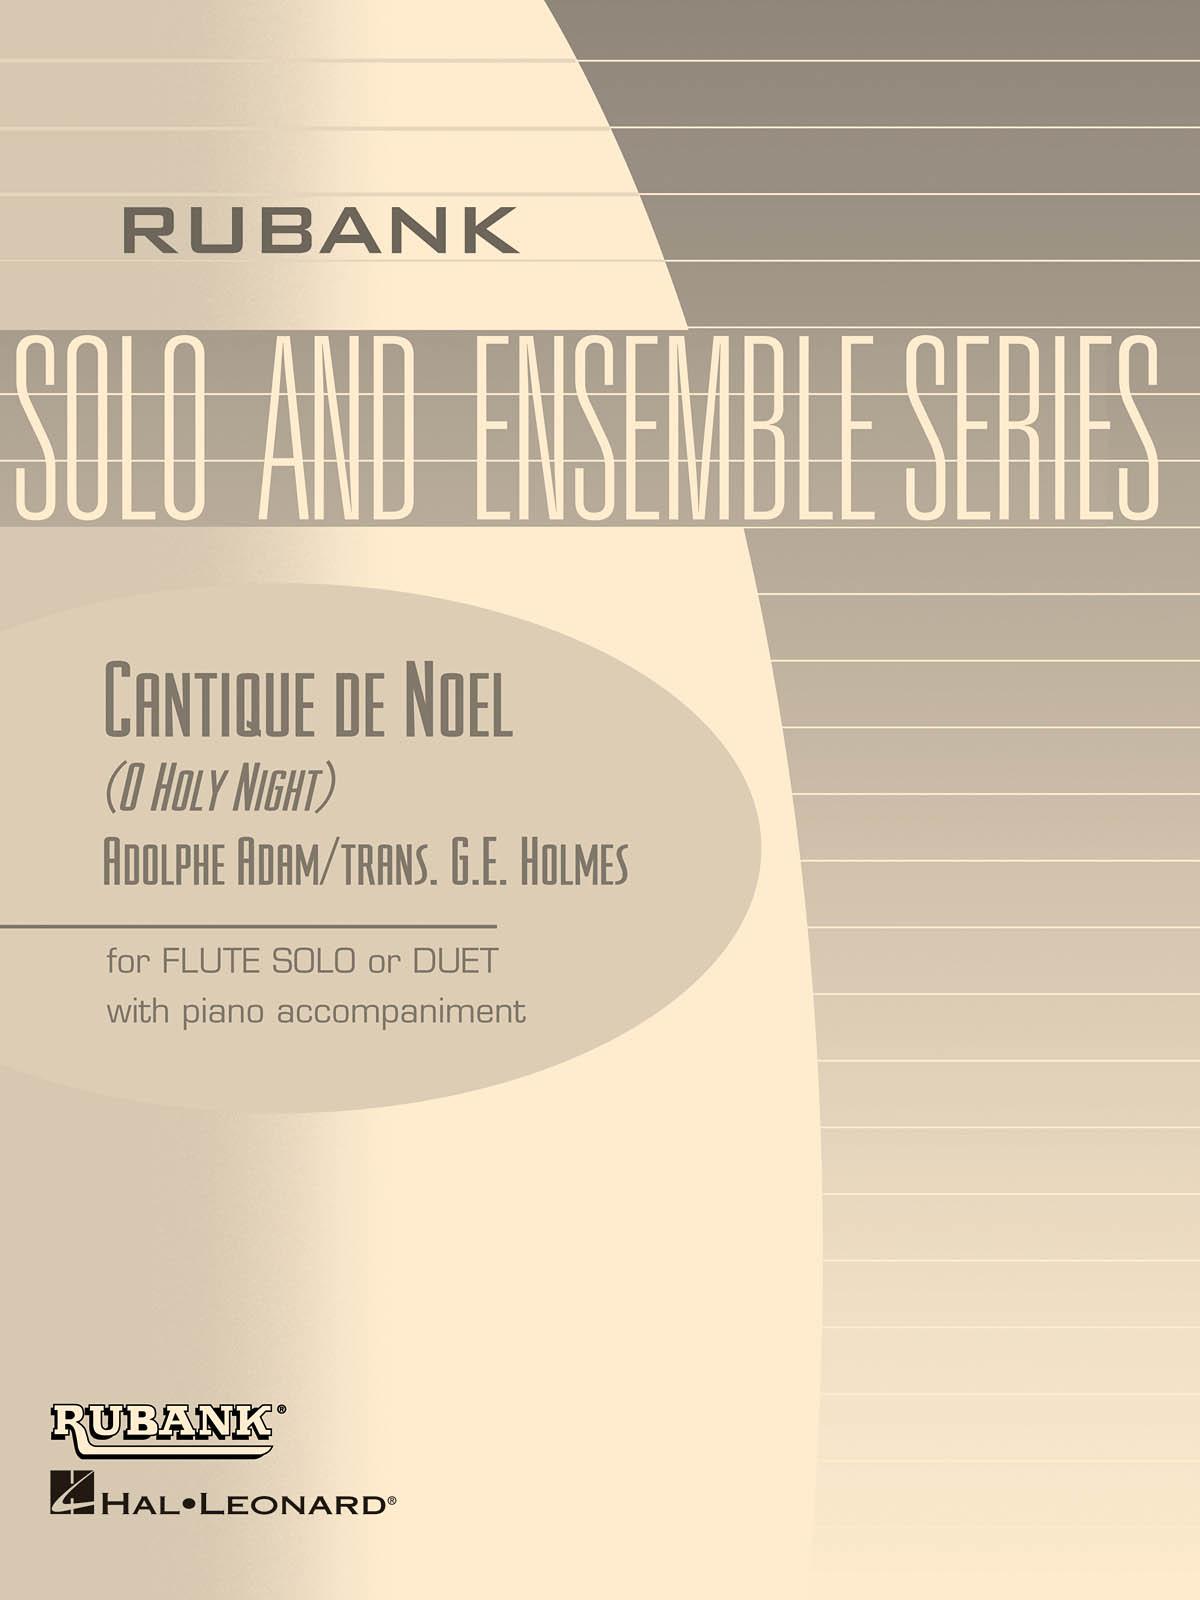 Adolphe Charles Adam: Cantique de No?l (O Holy Night): Flute Solo: Score and